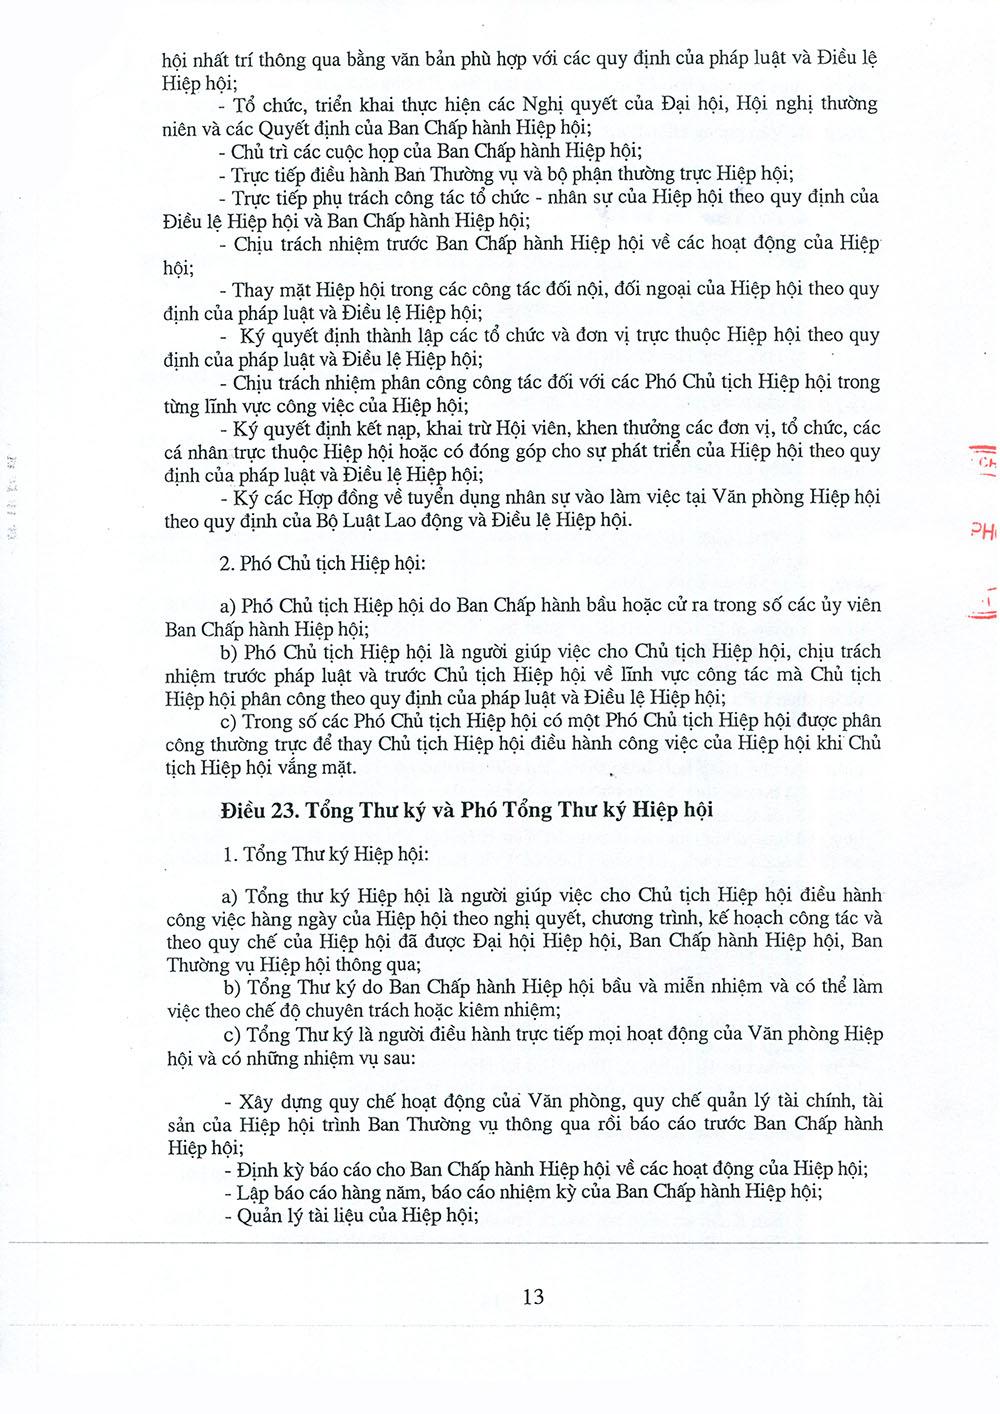 14 DIEU LE VKA - Trang 13